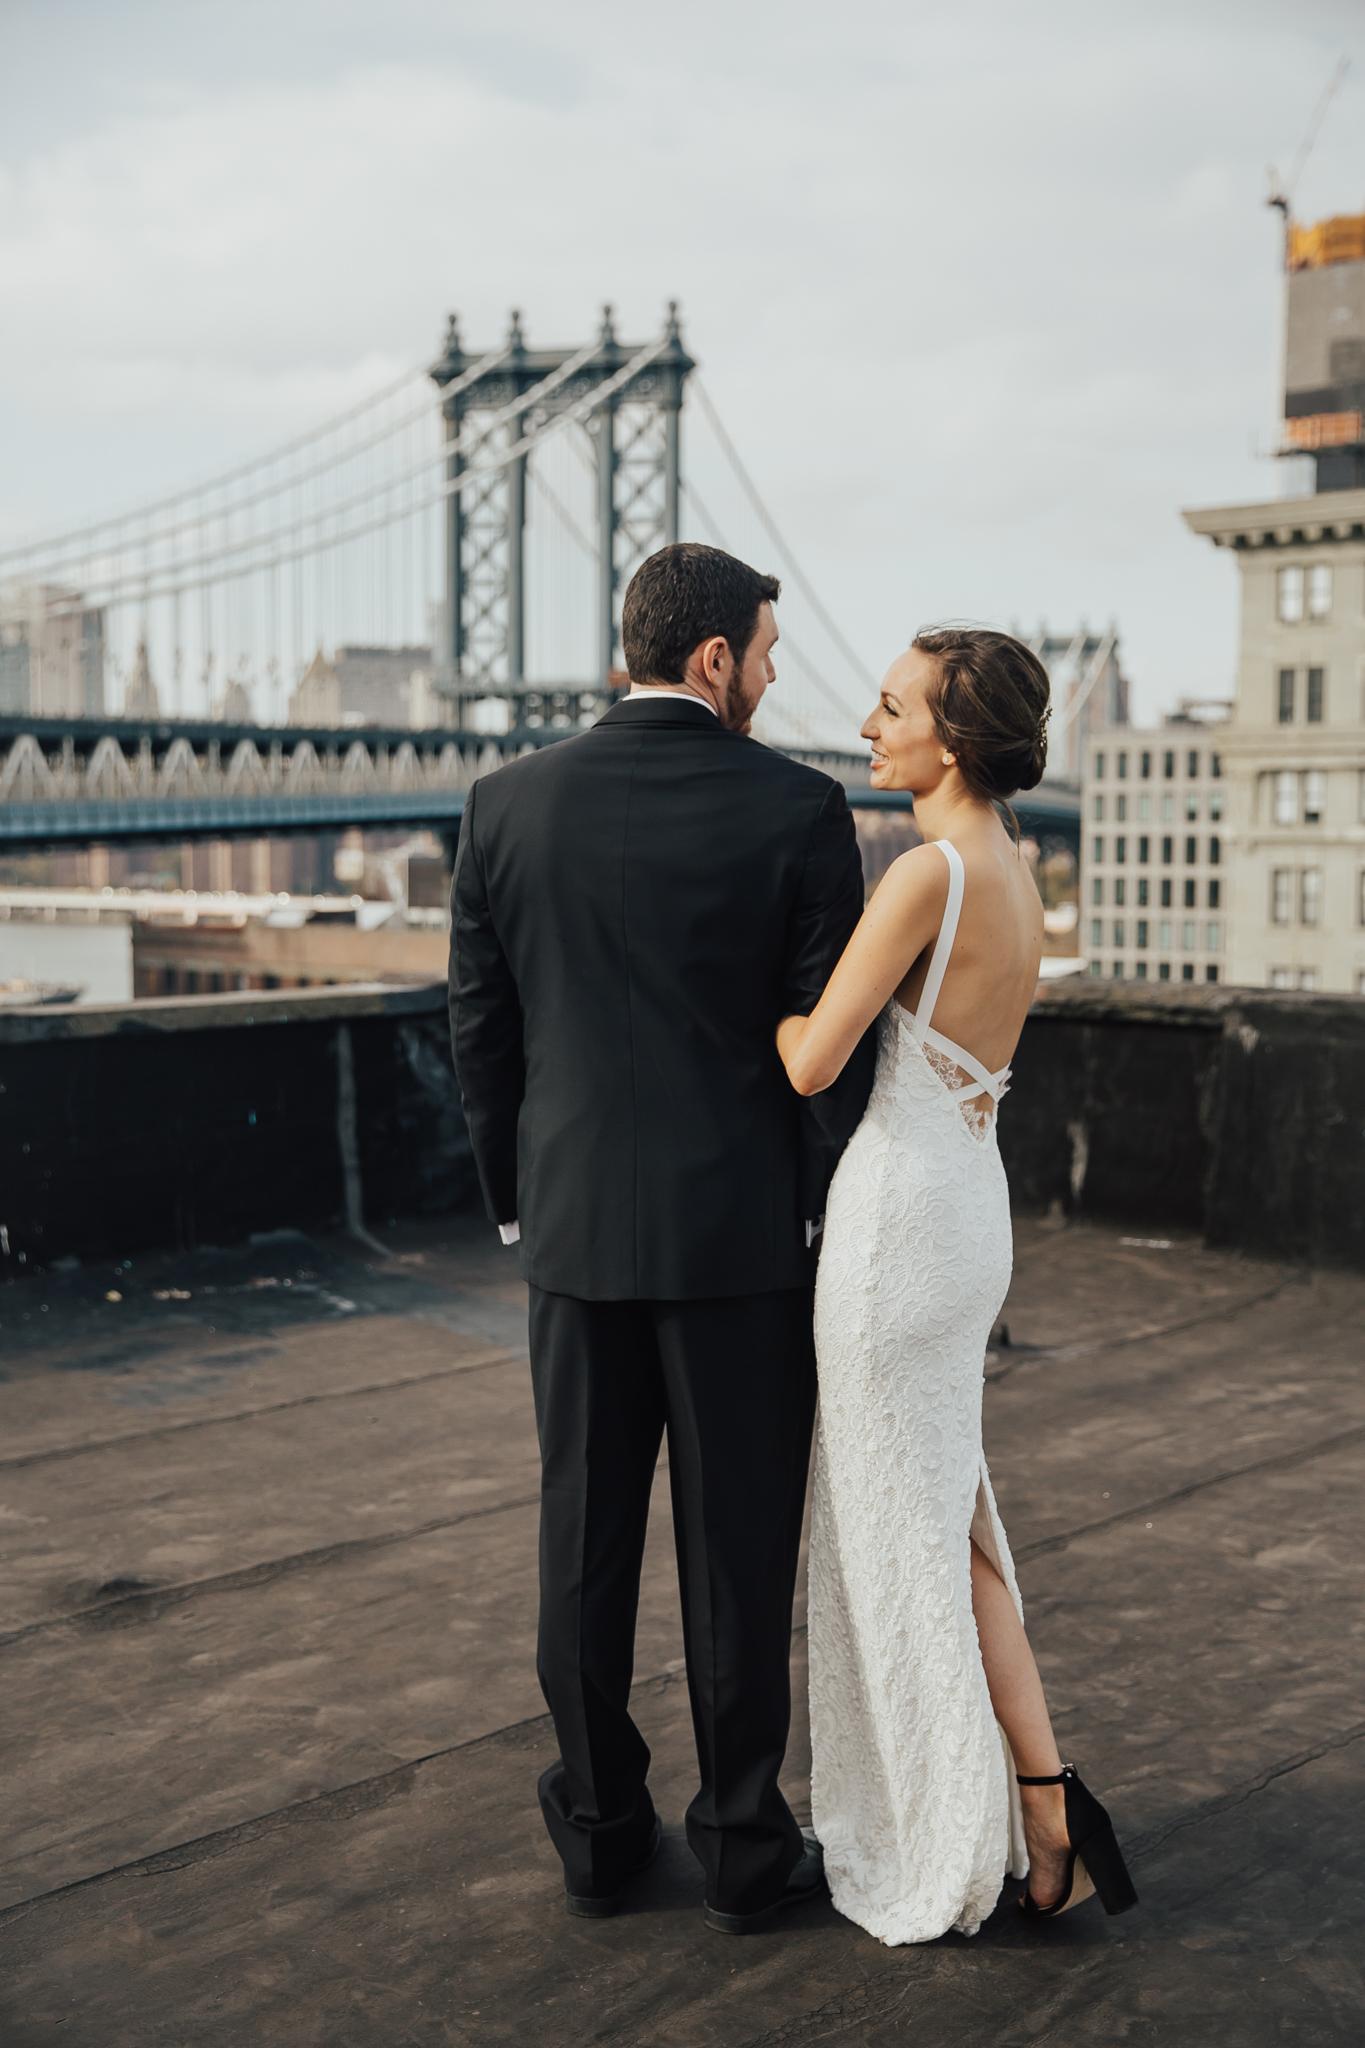 26-bridge-wedding-brooklyn-019.JPG